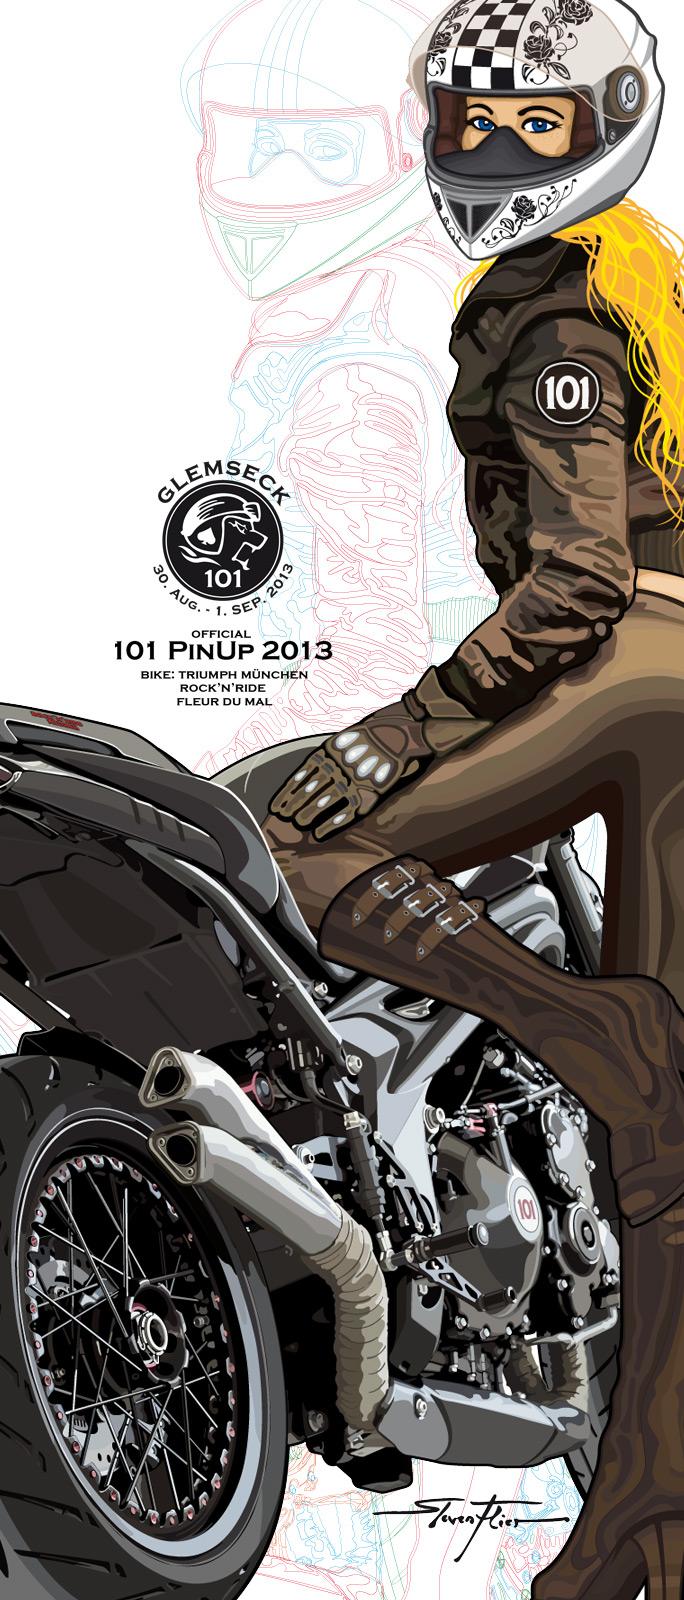 PinUp, Vector, Vektor, Illustration, Glemseck 101, 2013, Steven Flier, Fleur du Mal, Triumph München, Rock'n'Ride